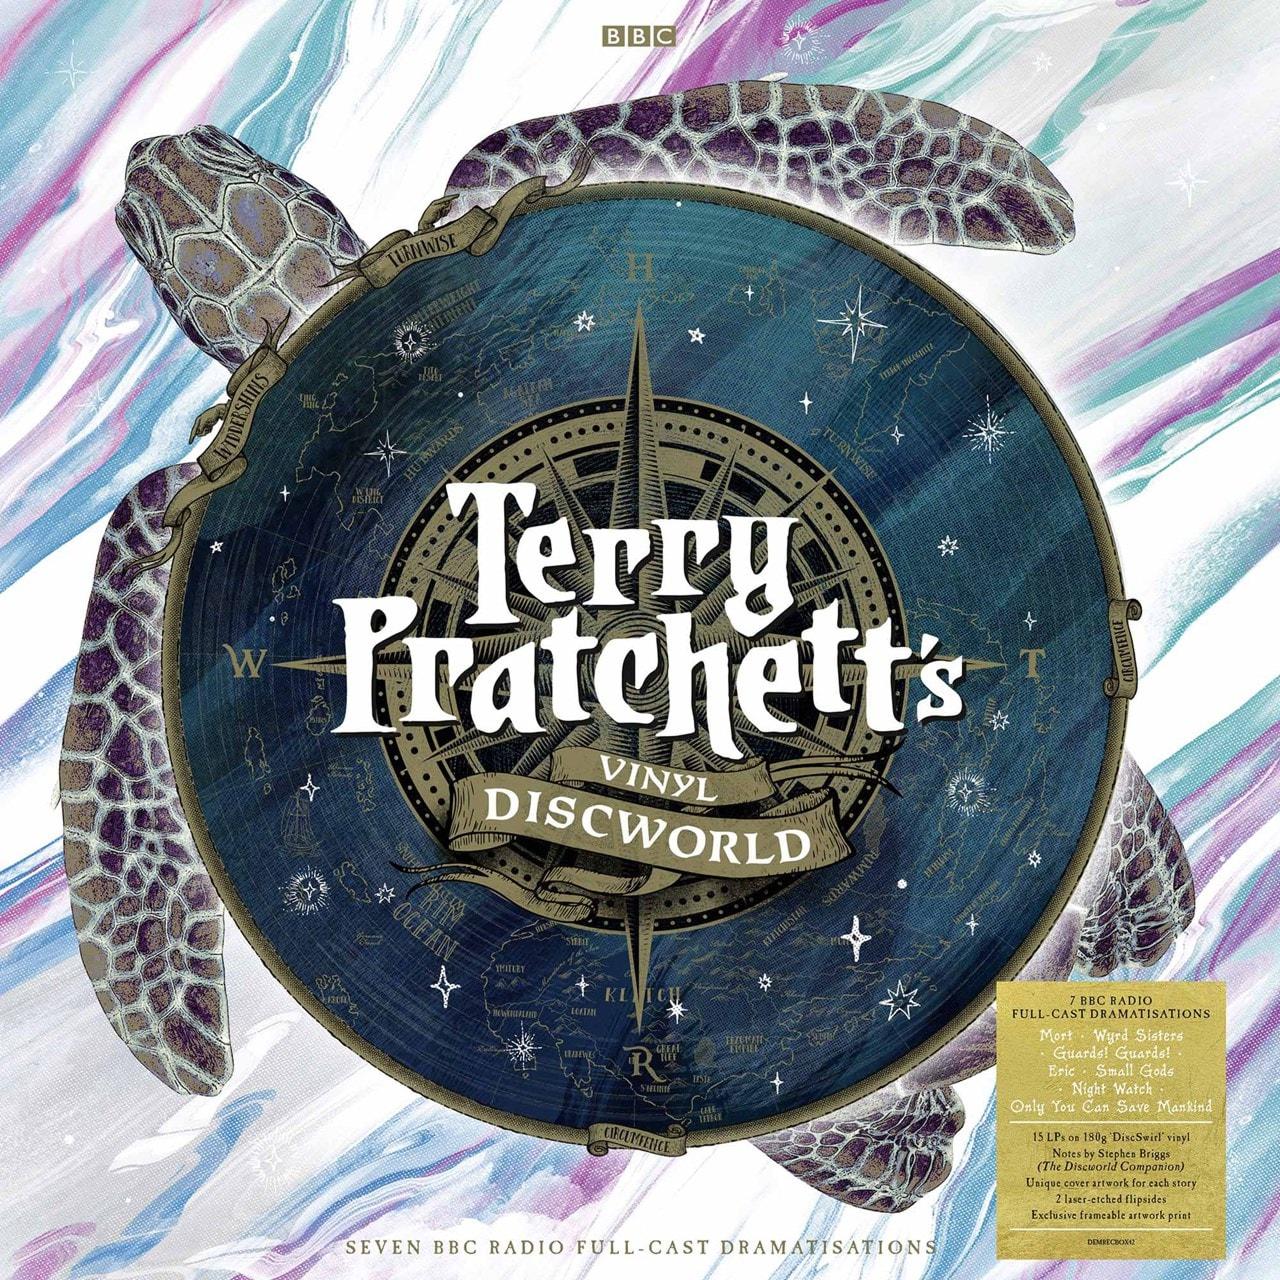 Terry Pratchett's Vinyl Discworld: Seven BBC Radio Full Cast Dramatisations - 1